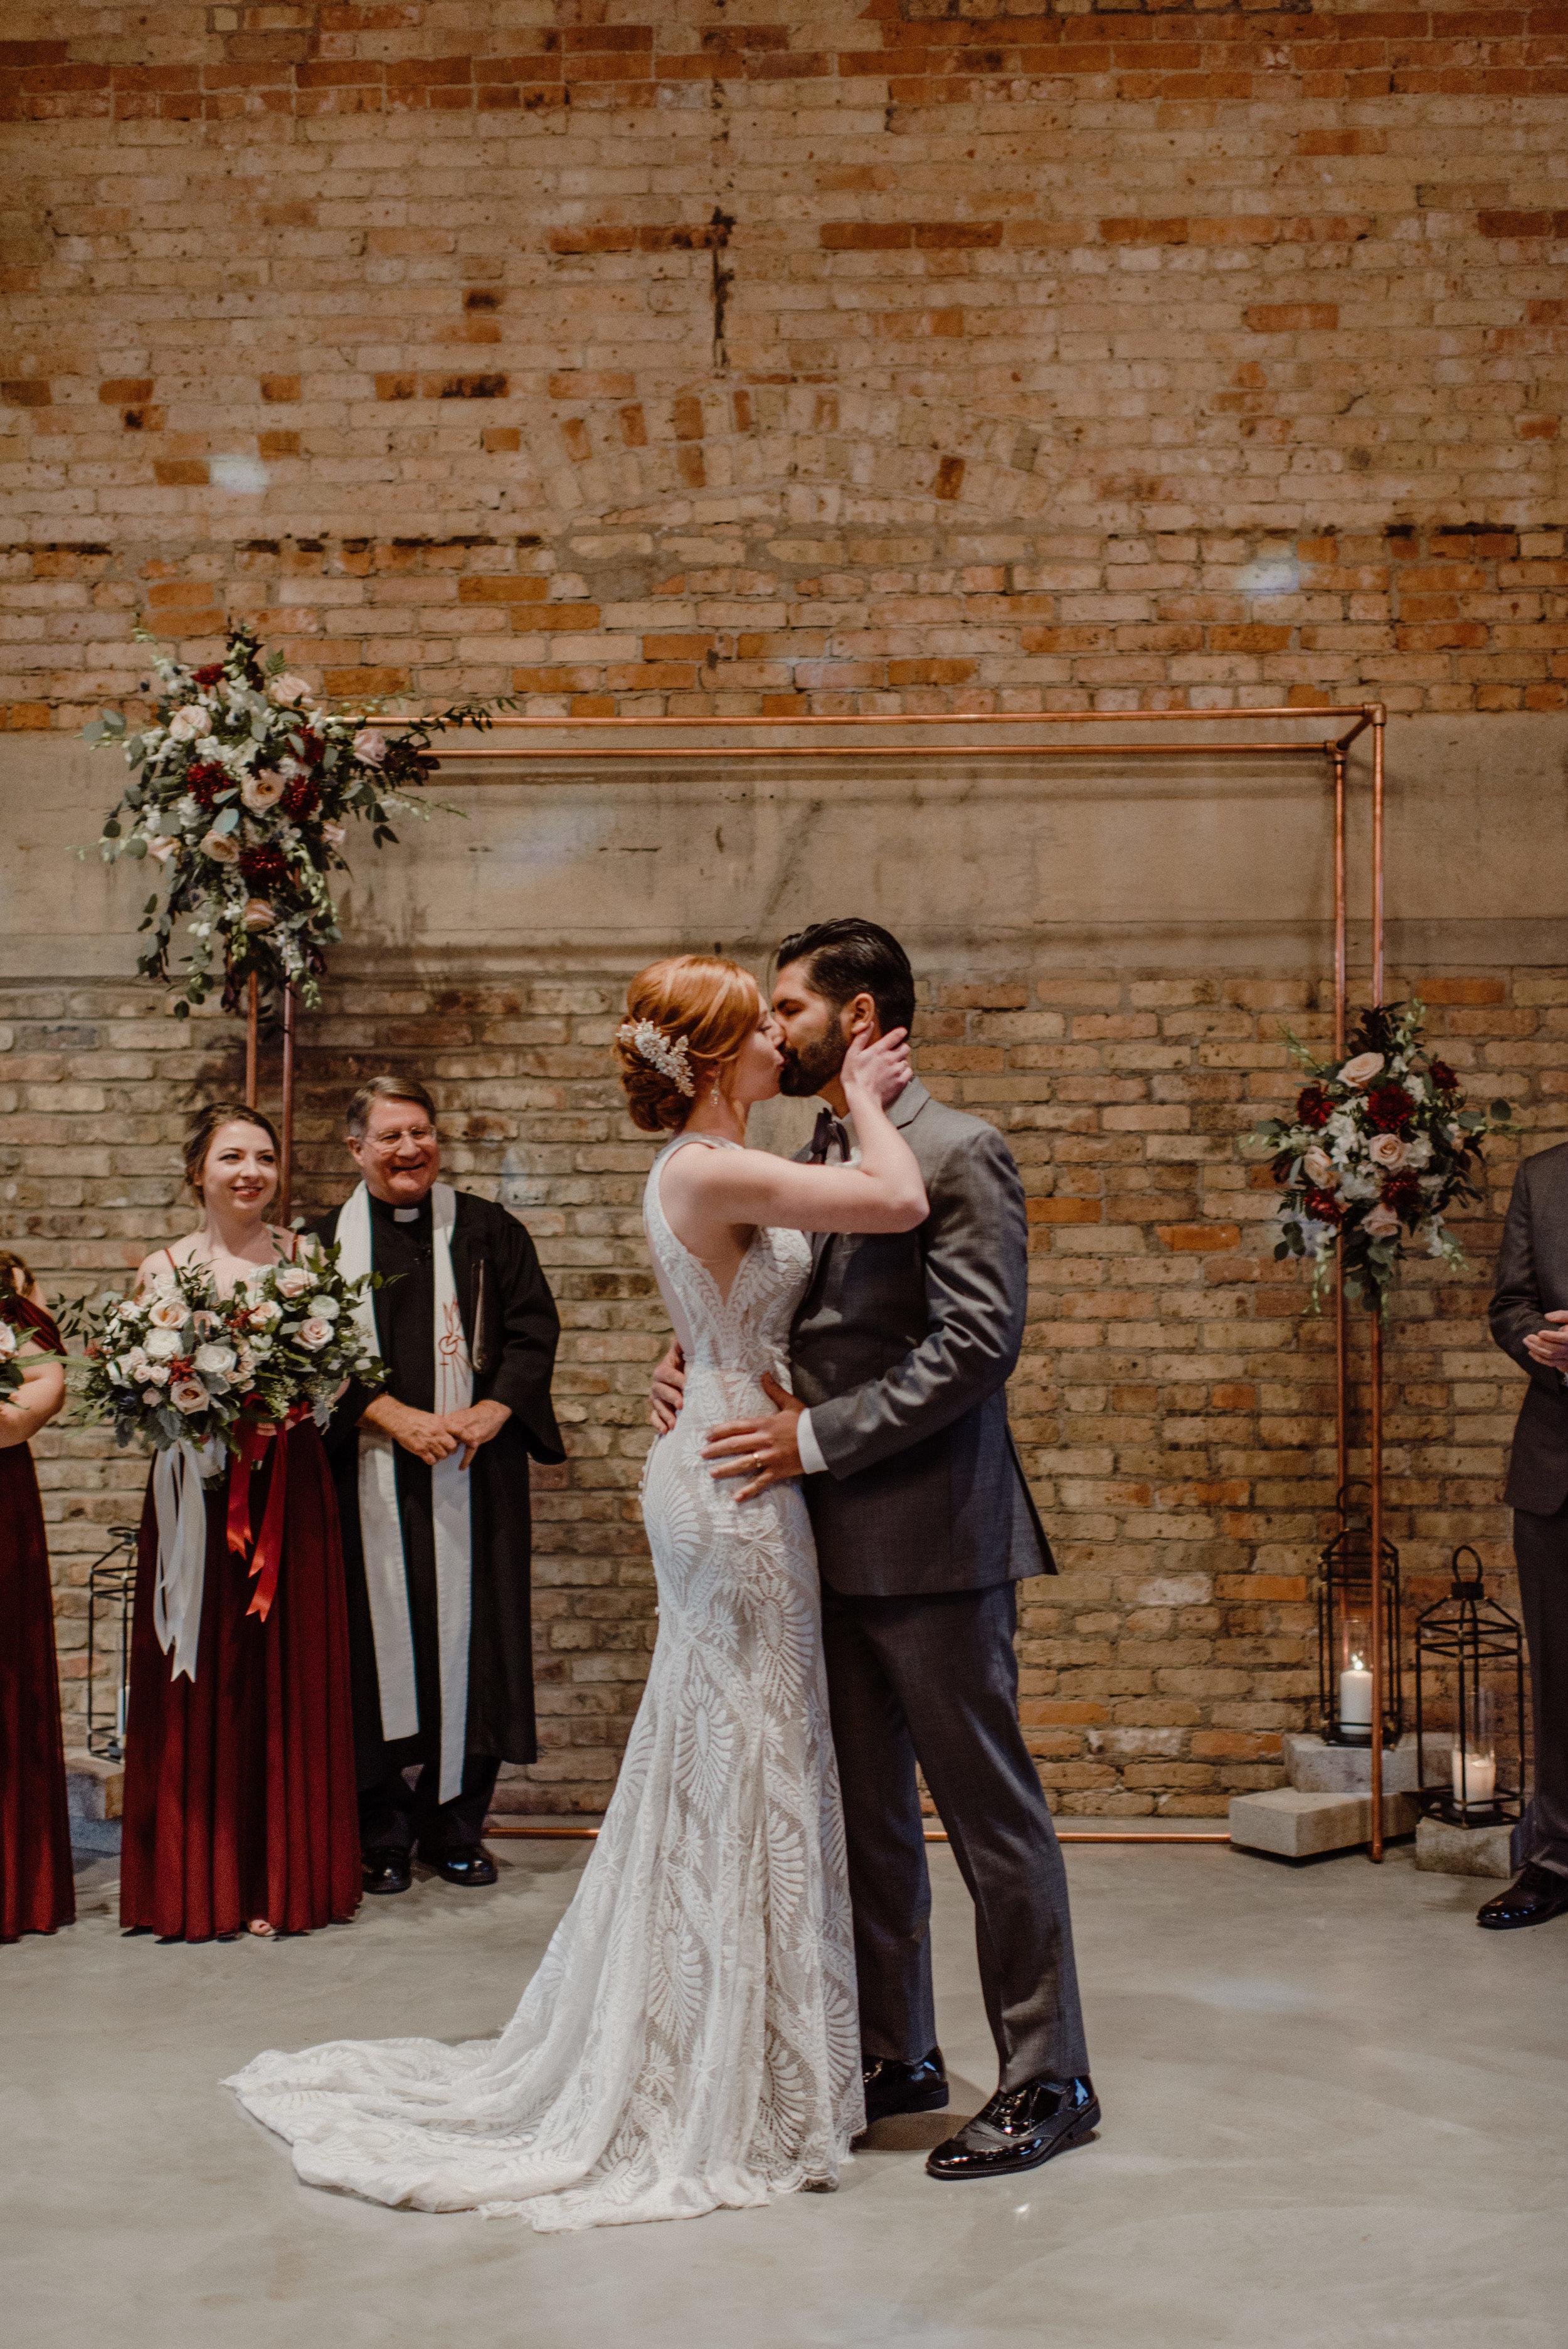 The Brix on Fox, Chicago Wedding Photographer, Zach and Rosalie00009.jpg